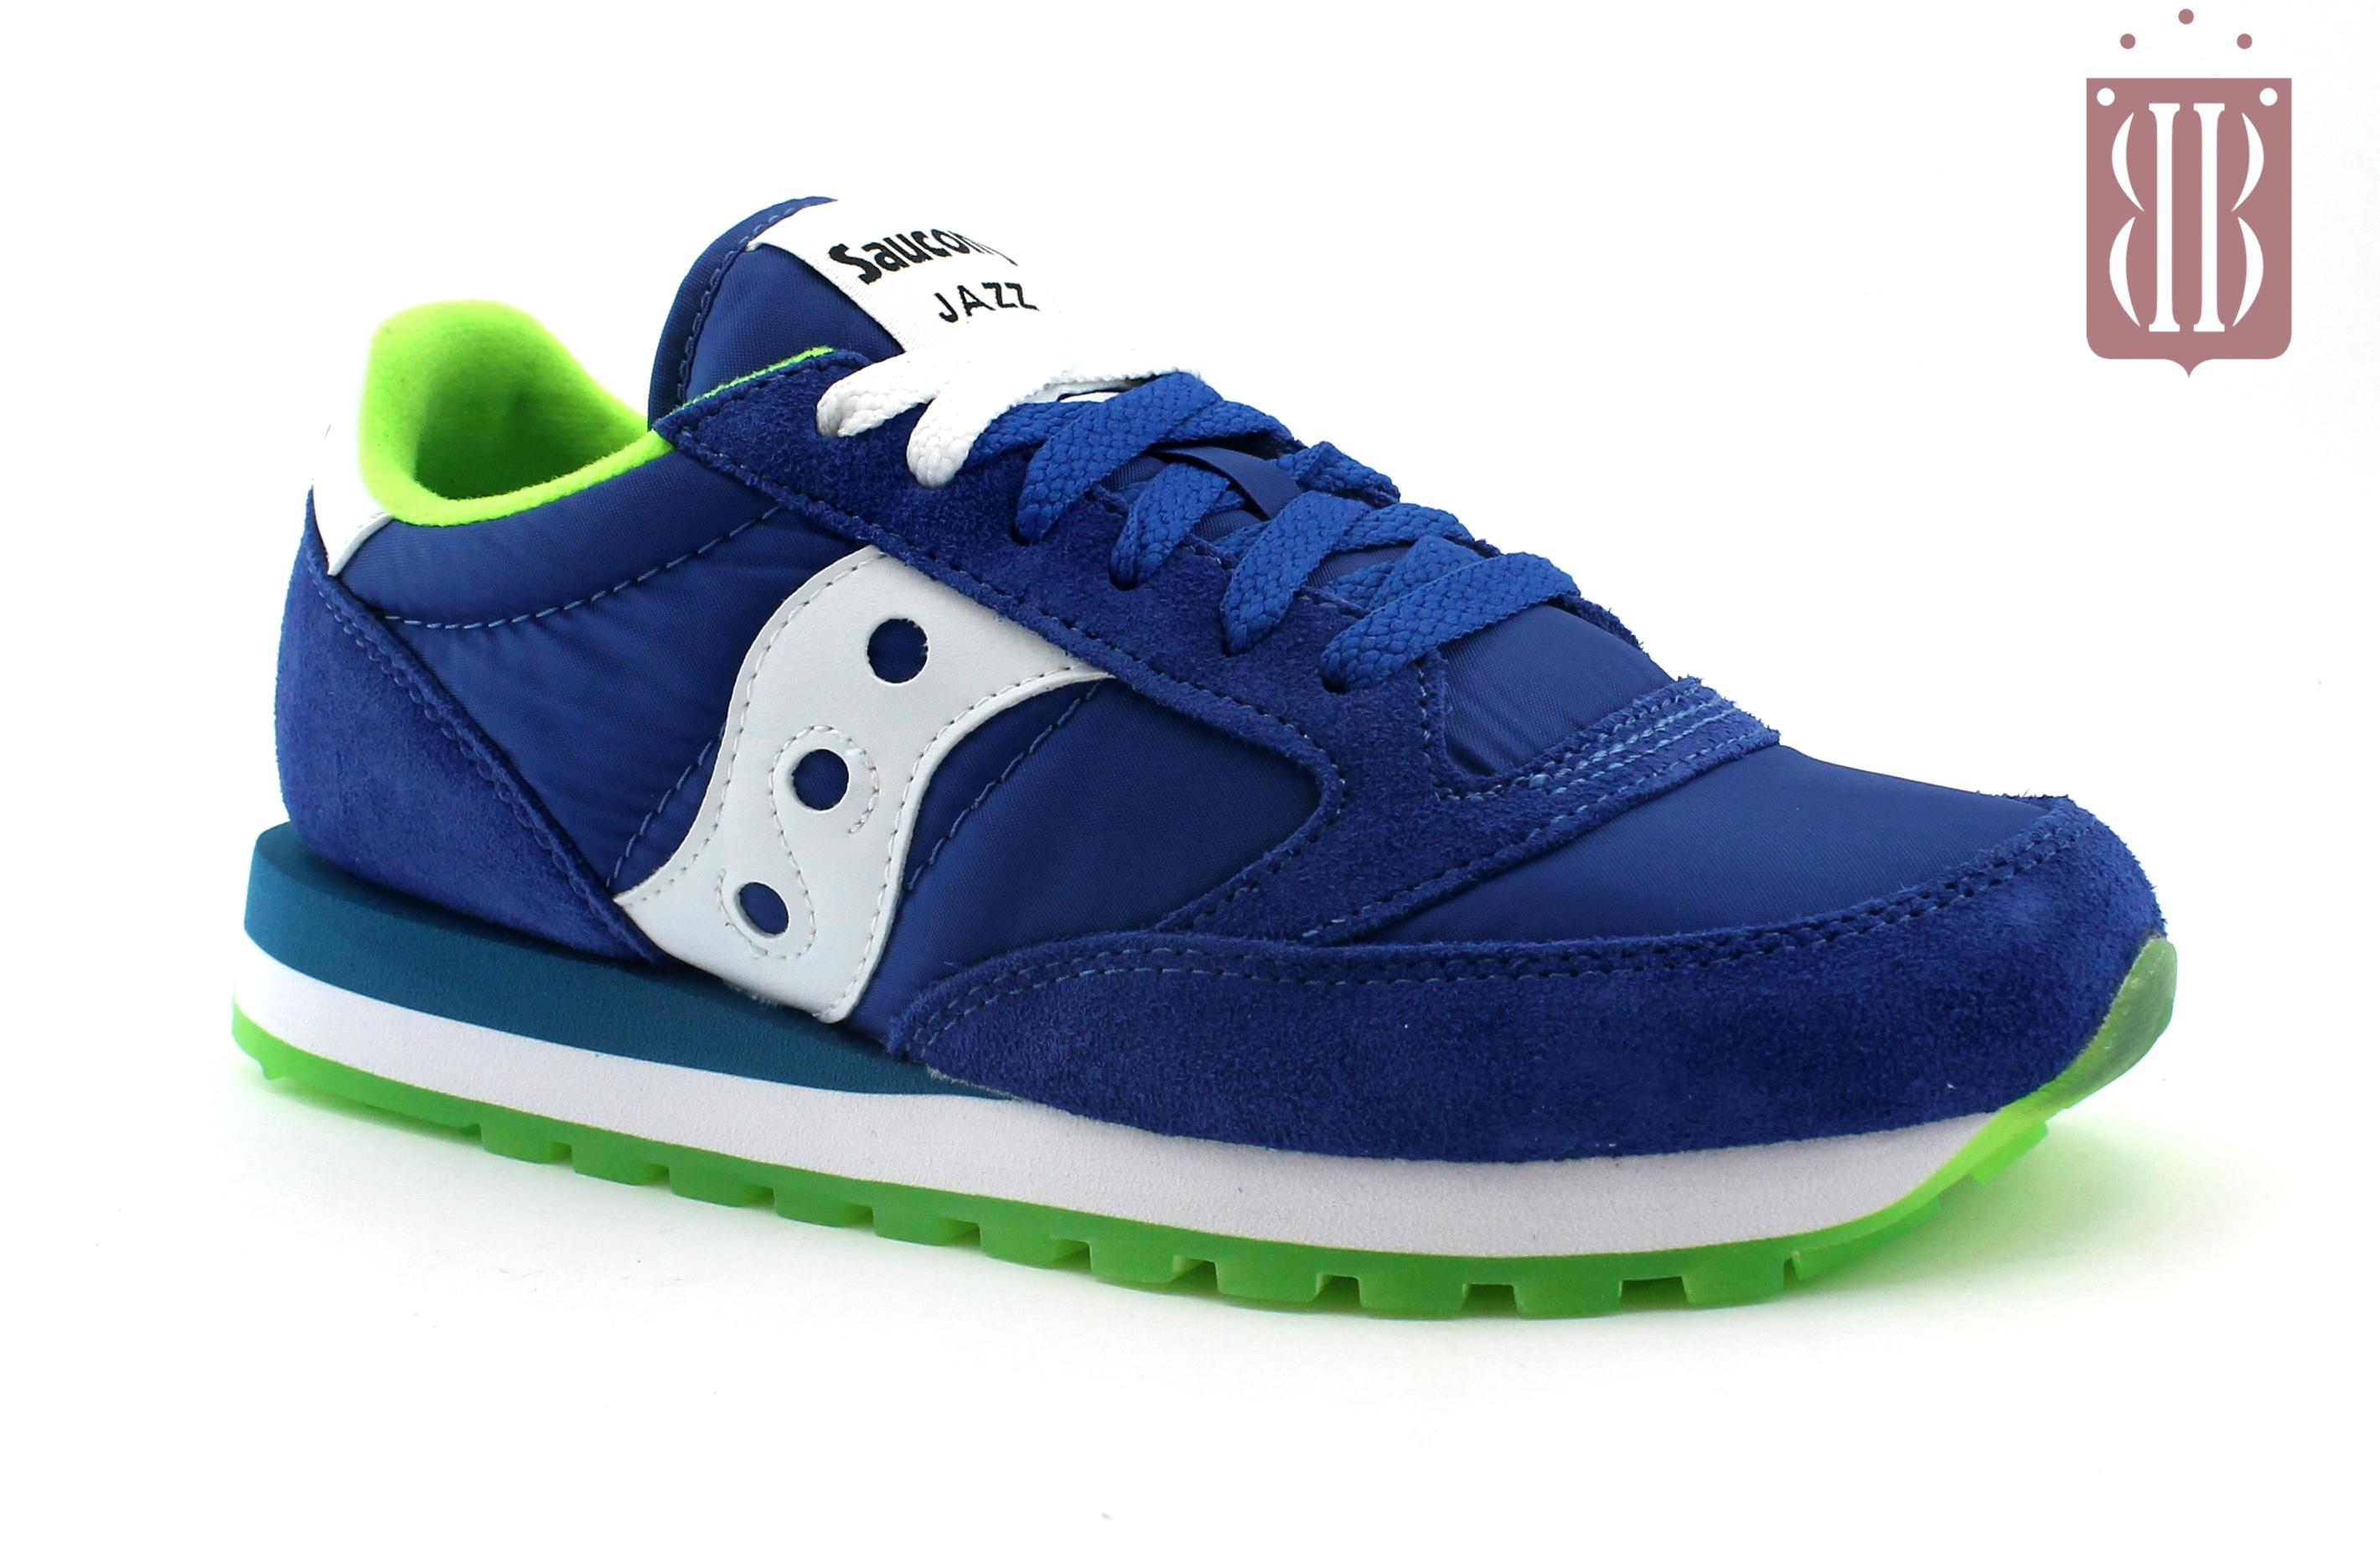 SAUCONY 2044 256 JAZZ ORIGINAL blu lime scarpe uomo sneakers lacci